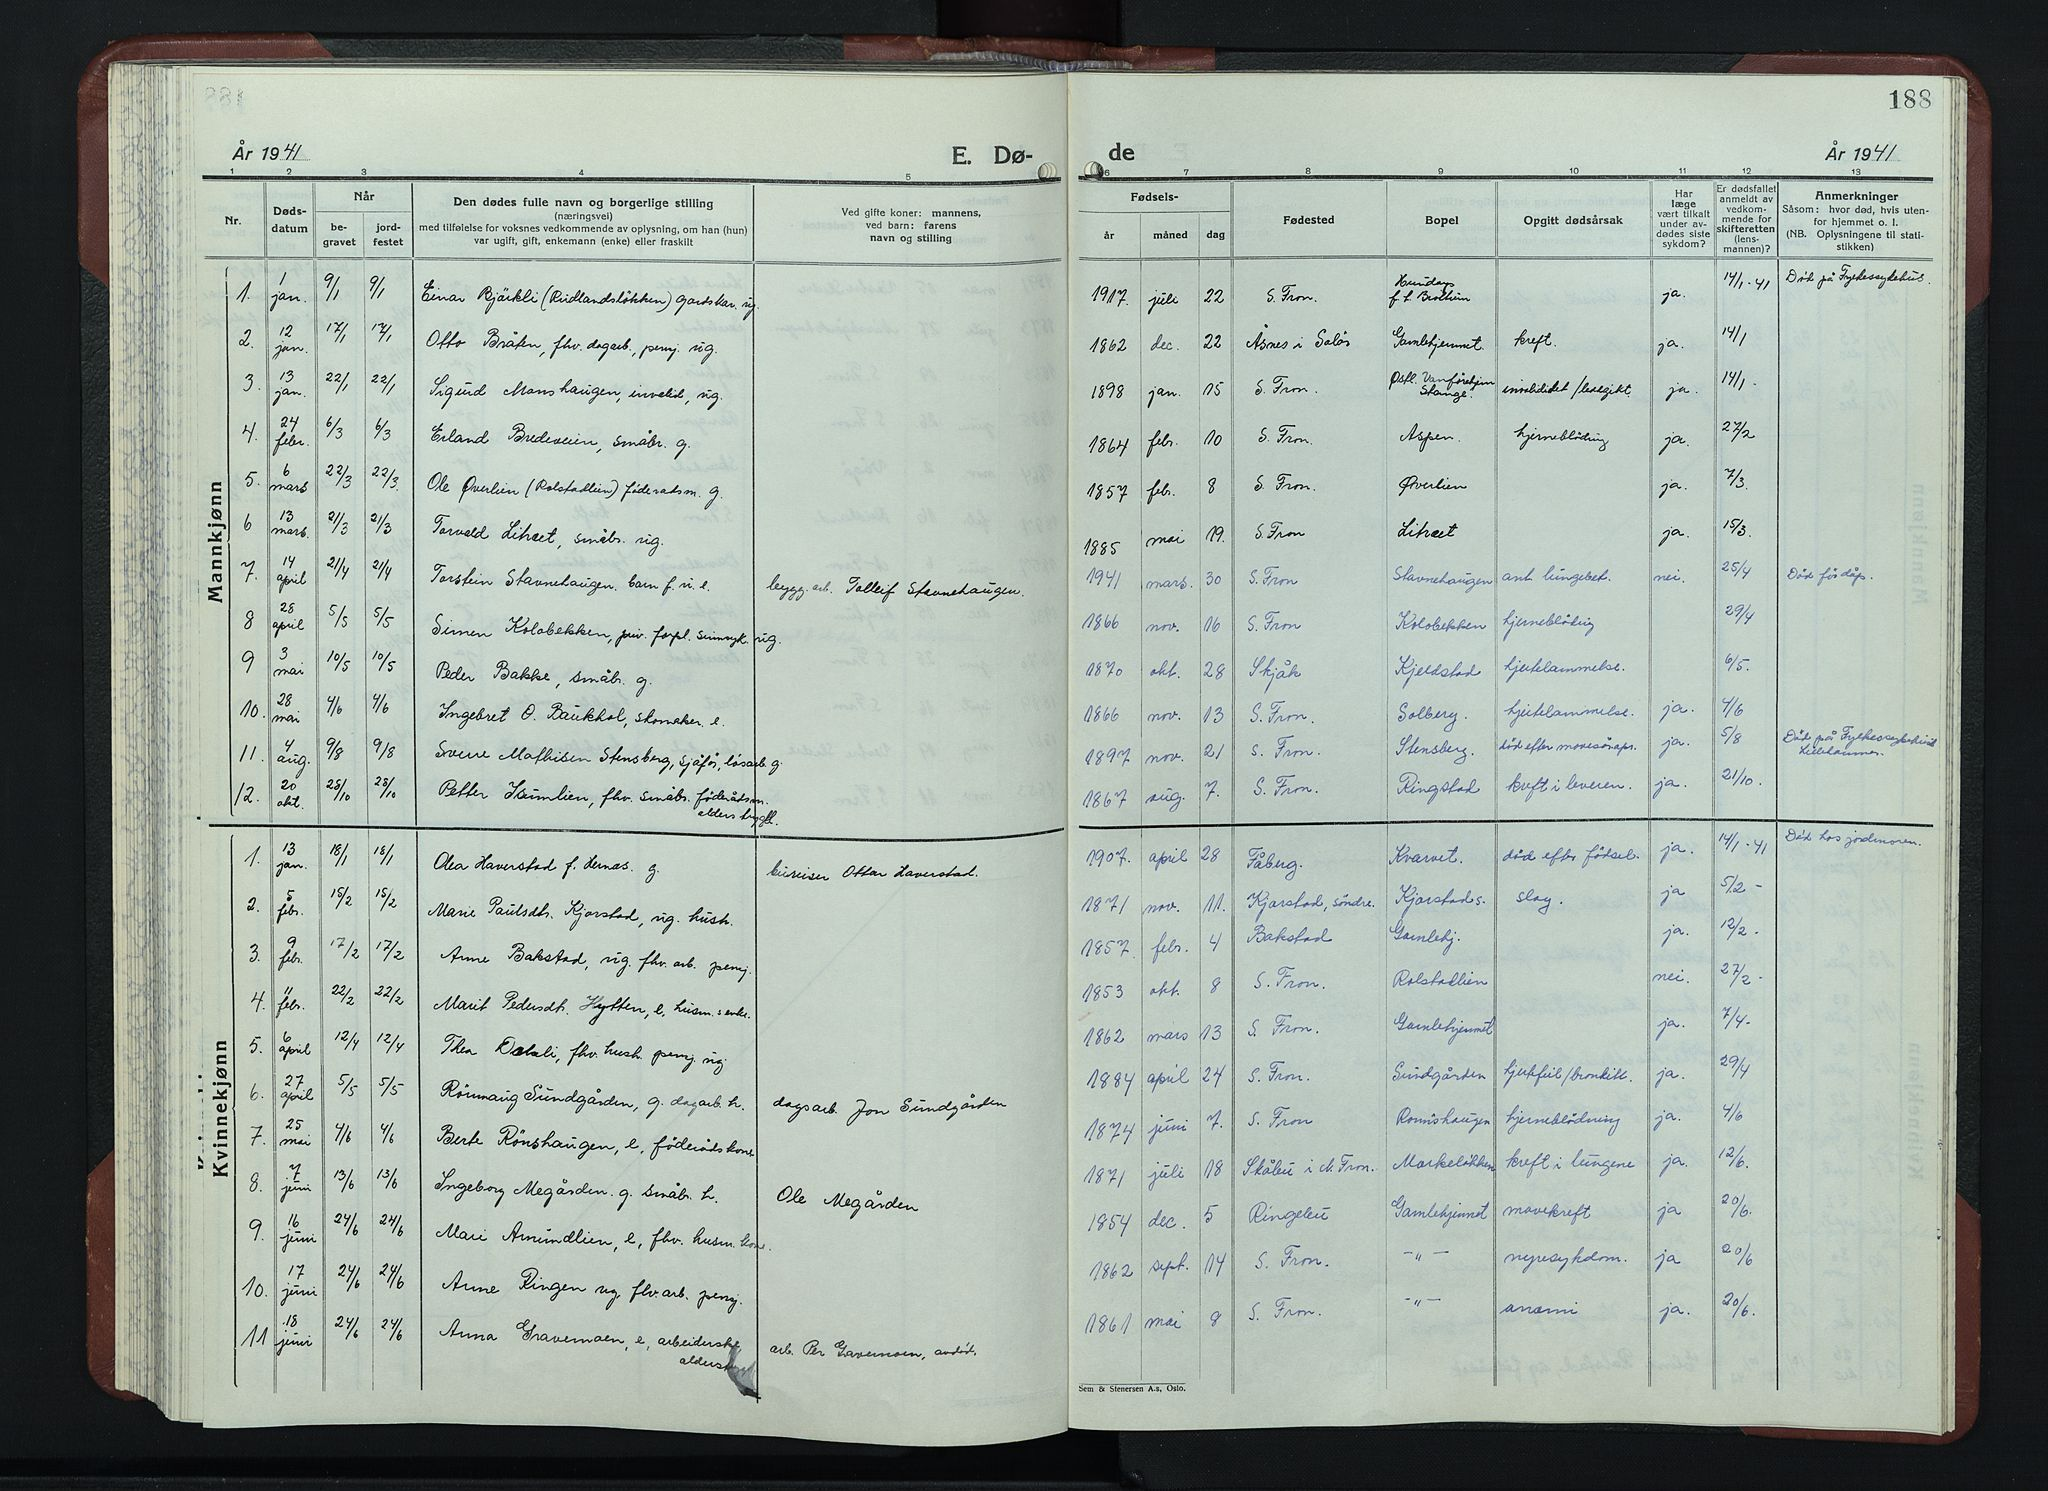 SAH, Sør-Fron prestekontor, H/Ha/Hab/L0006: Klokkerbok nr. 6, 1933-1948, s. 188